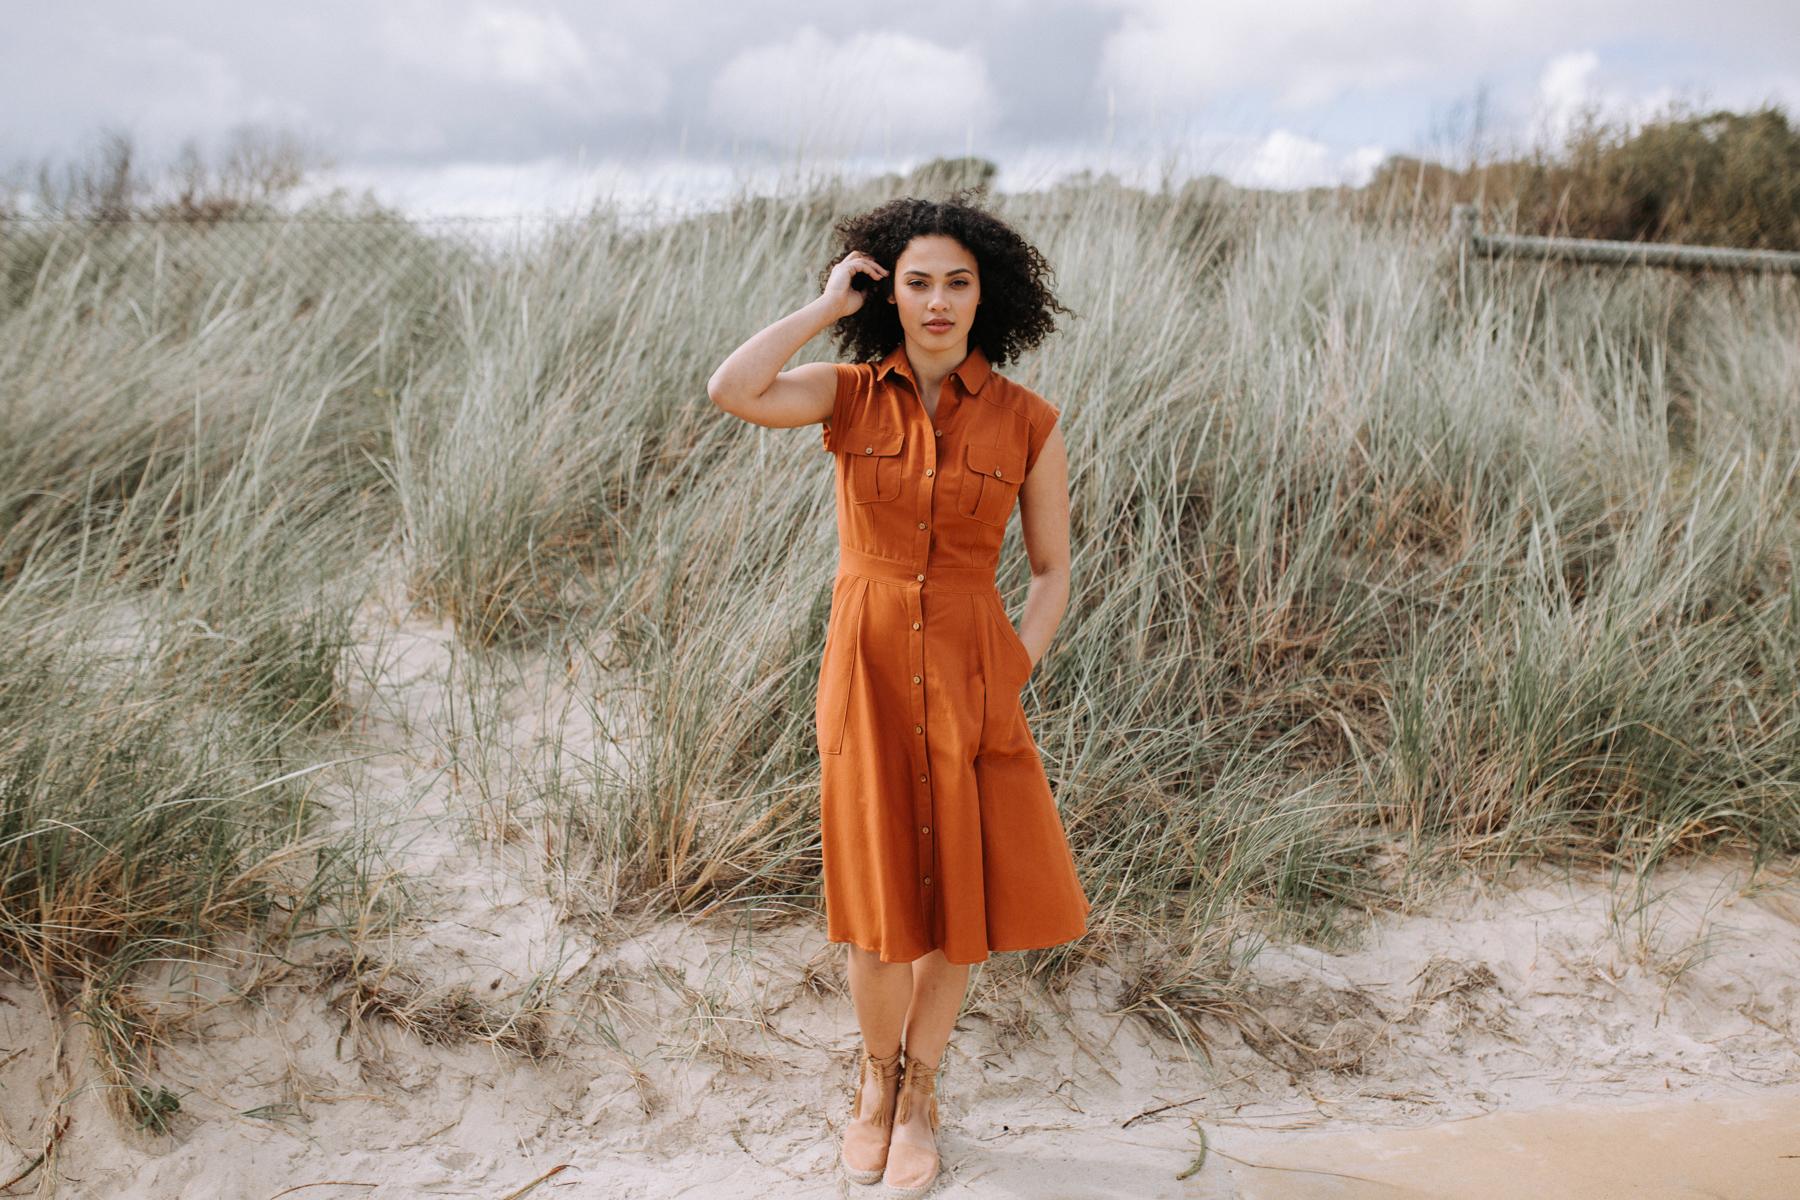 How to lengthen or shorten the Matilda dress pattern